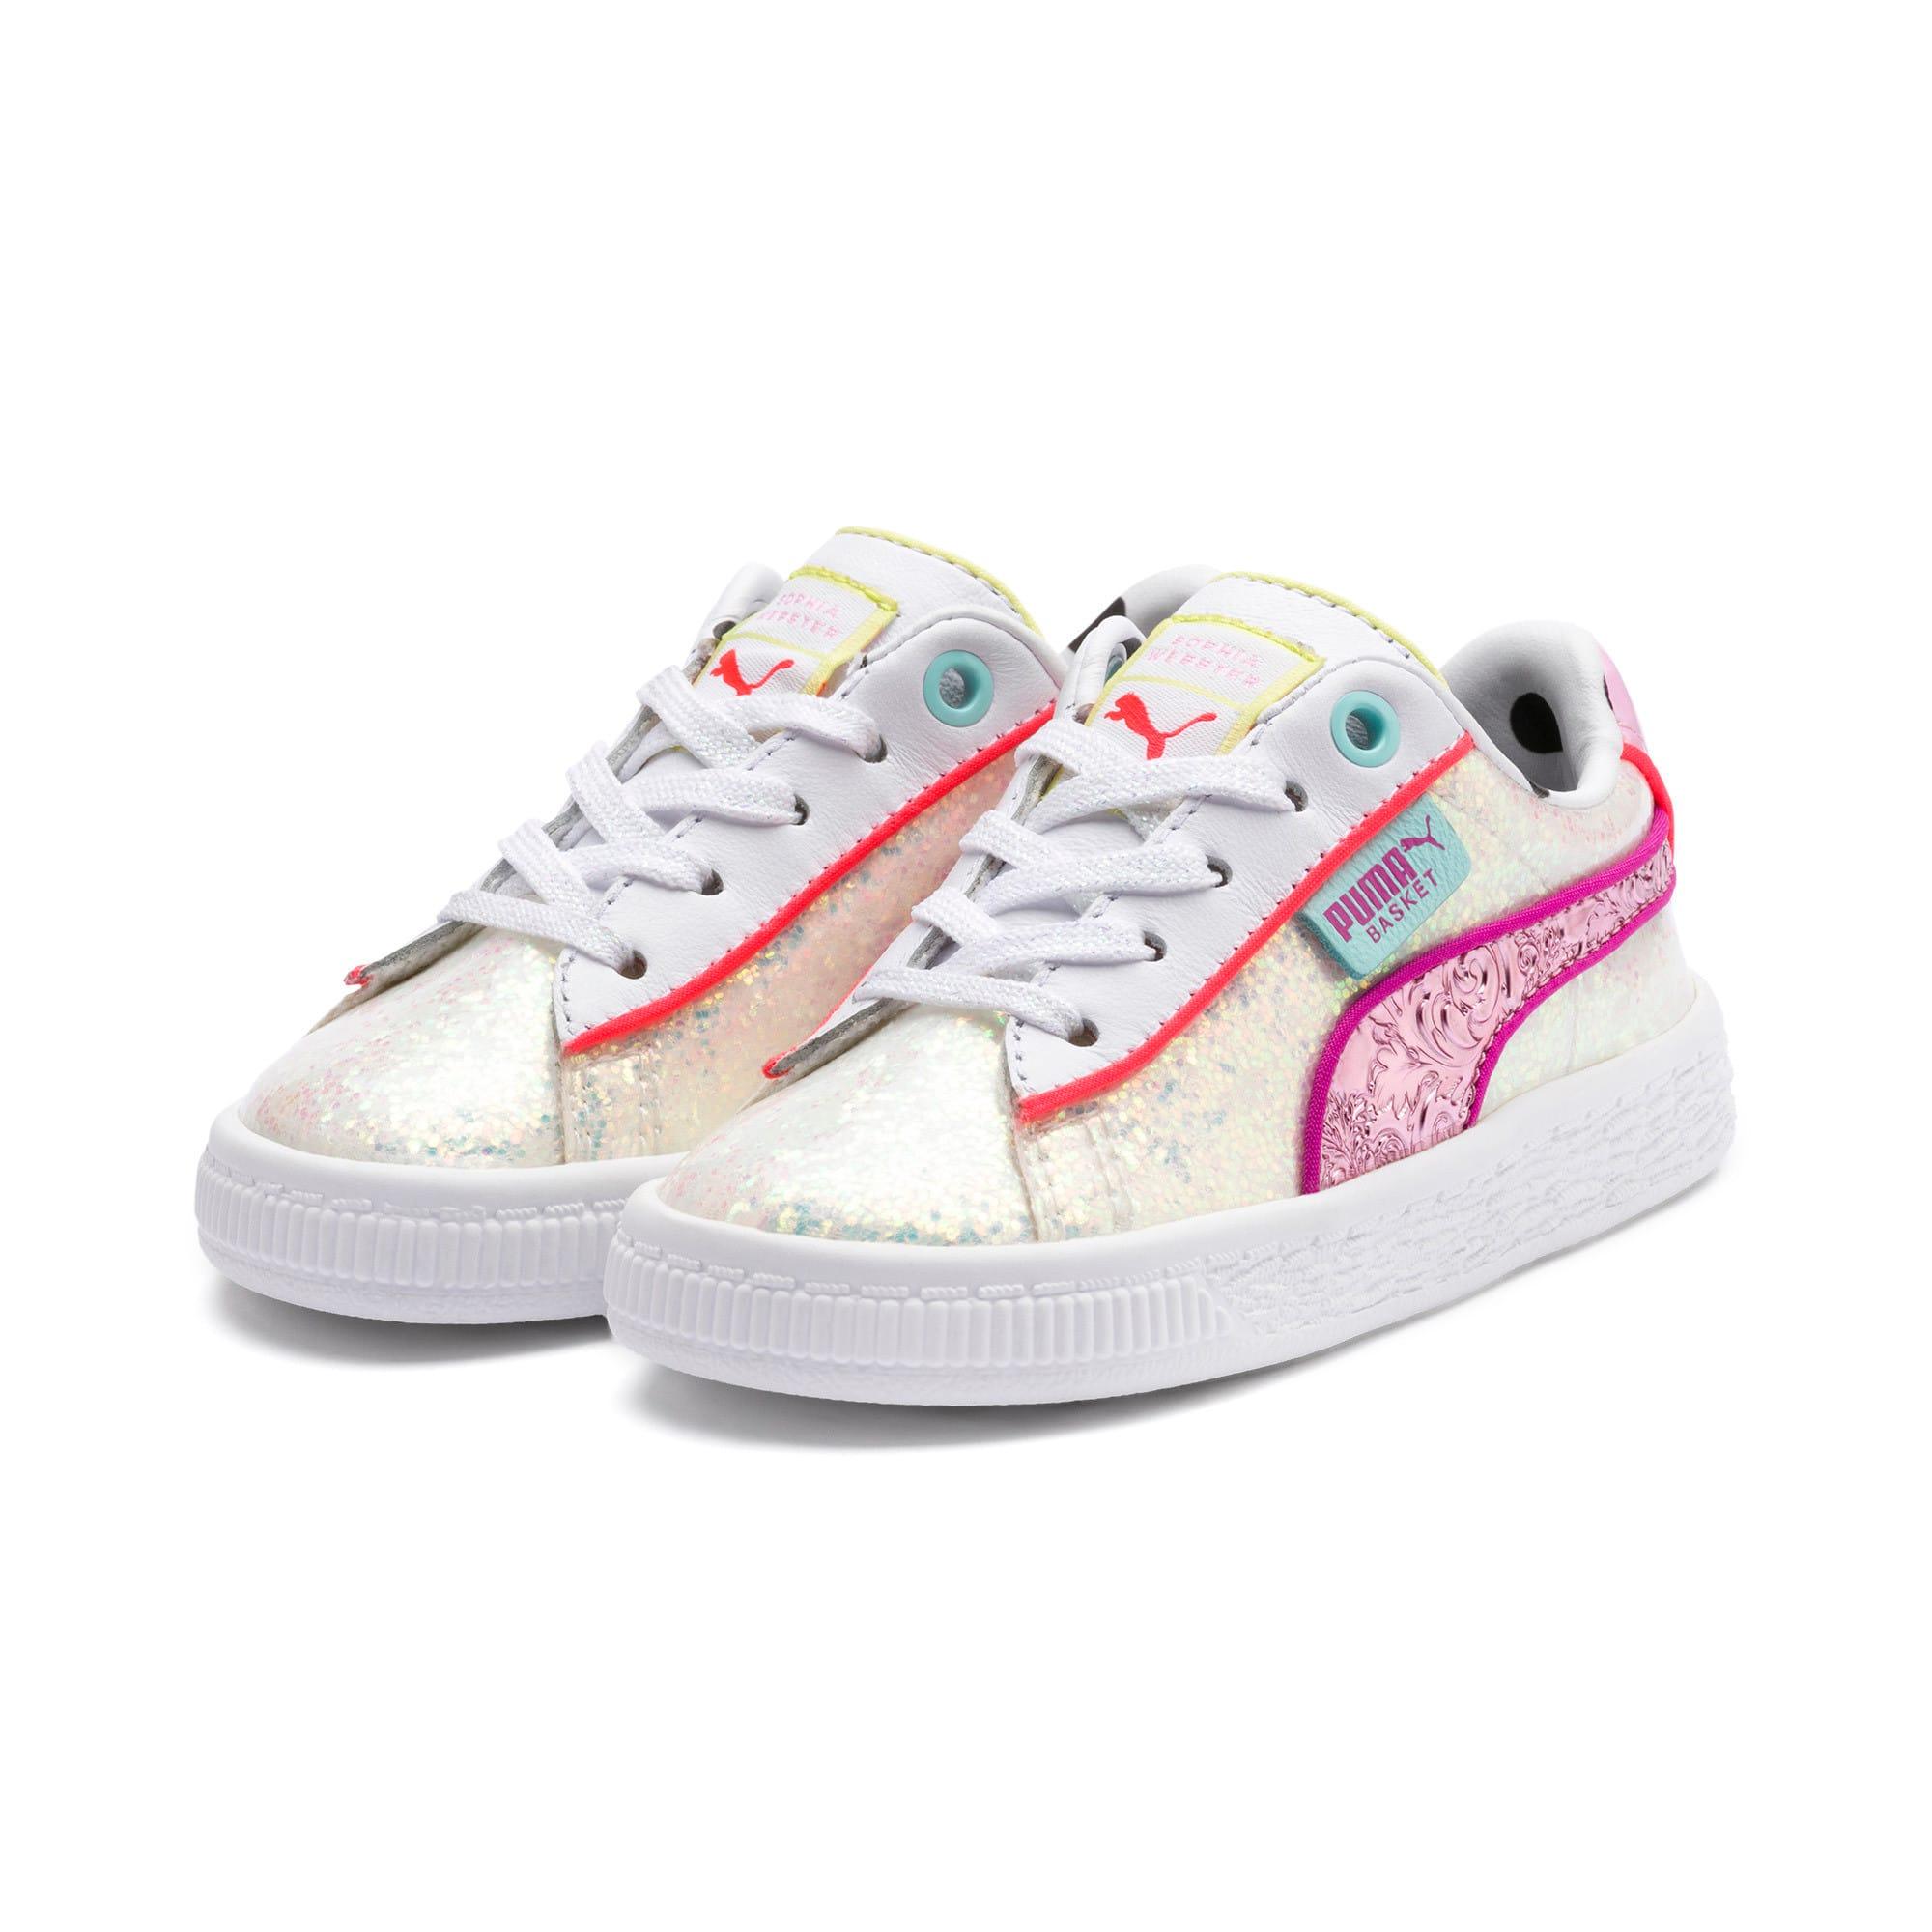 Thumbnail 2 of PUMA x SOPHIA WEBSTER Basket Toddler Shoes, Puma White-Pale Pink, medium